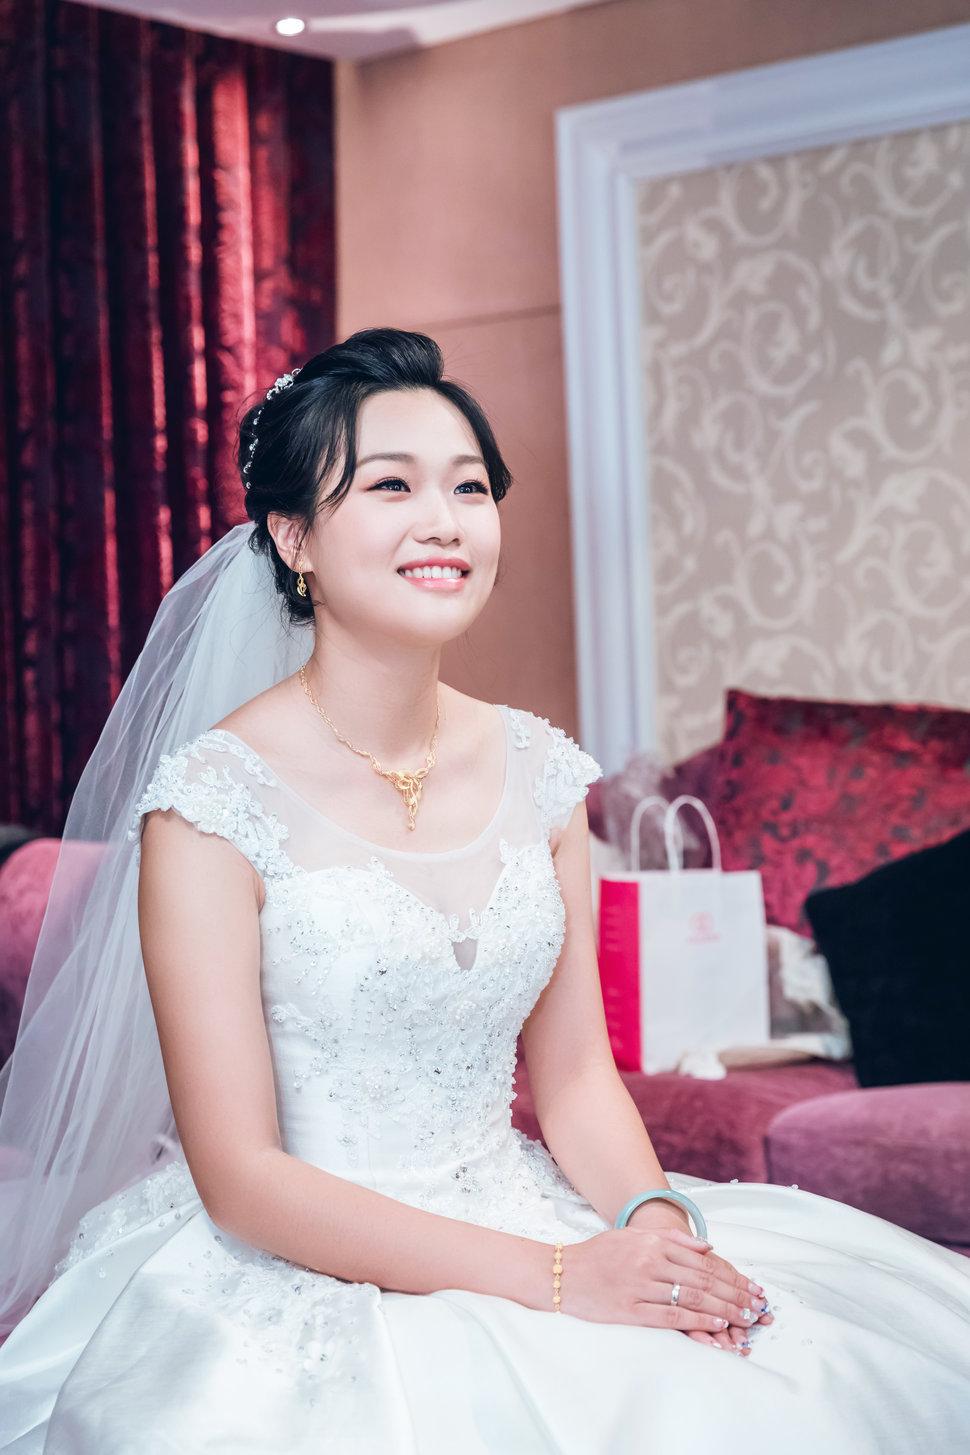 5D4_0360 - Promaker婚禮紀錄攝影團隊婚攝豪哥《結婚吧》